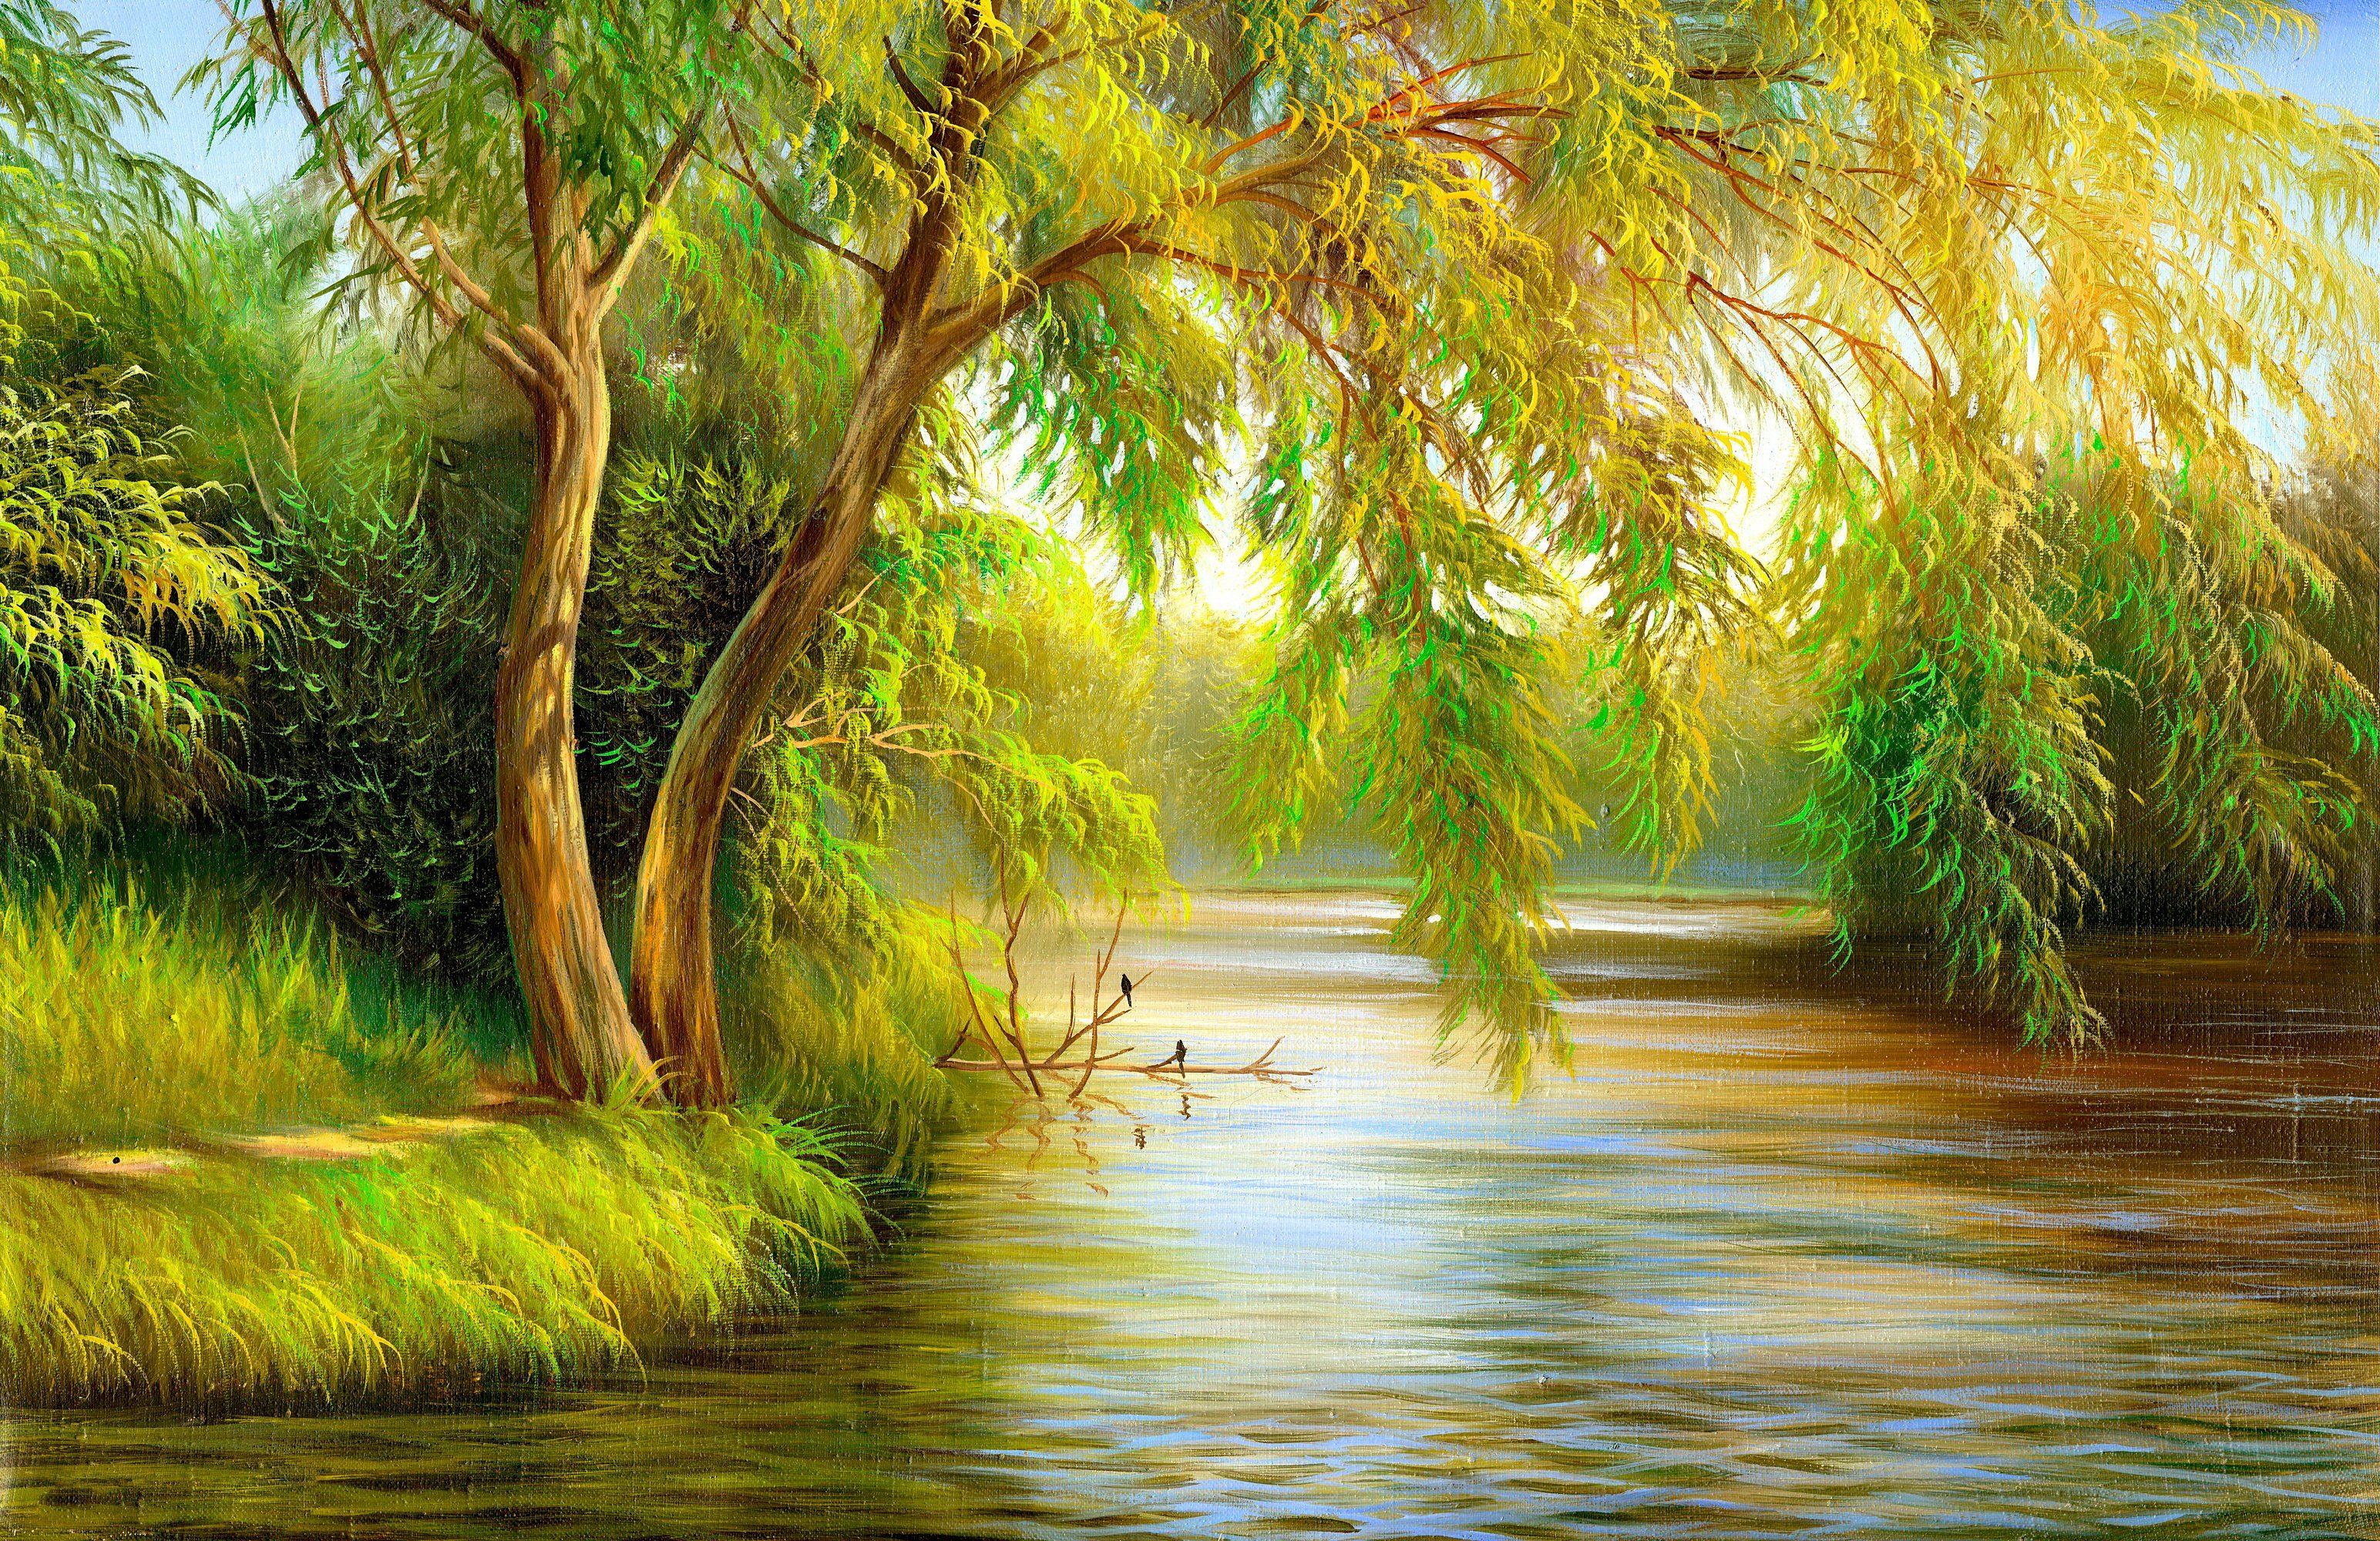 PAPERMOON Fototapete »Summer Wood Lake«, BlueBack, 7 Bahnen, 350 x 260 cm